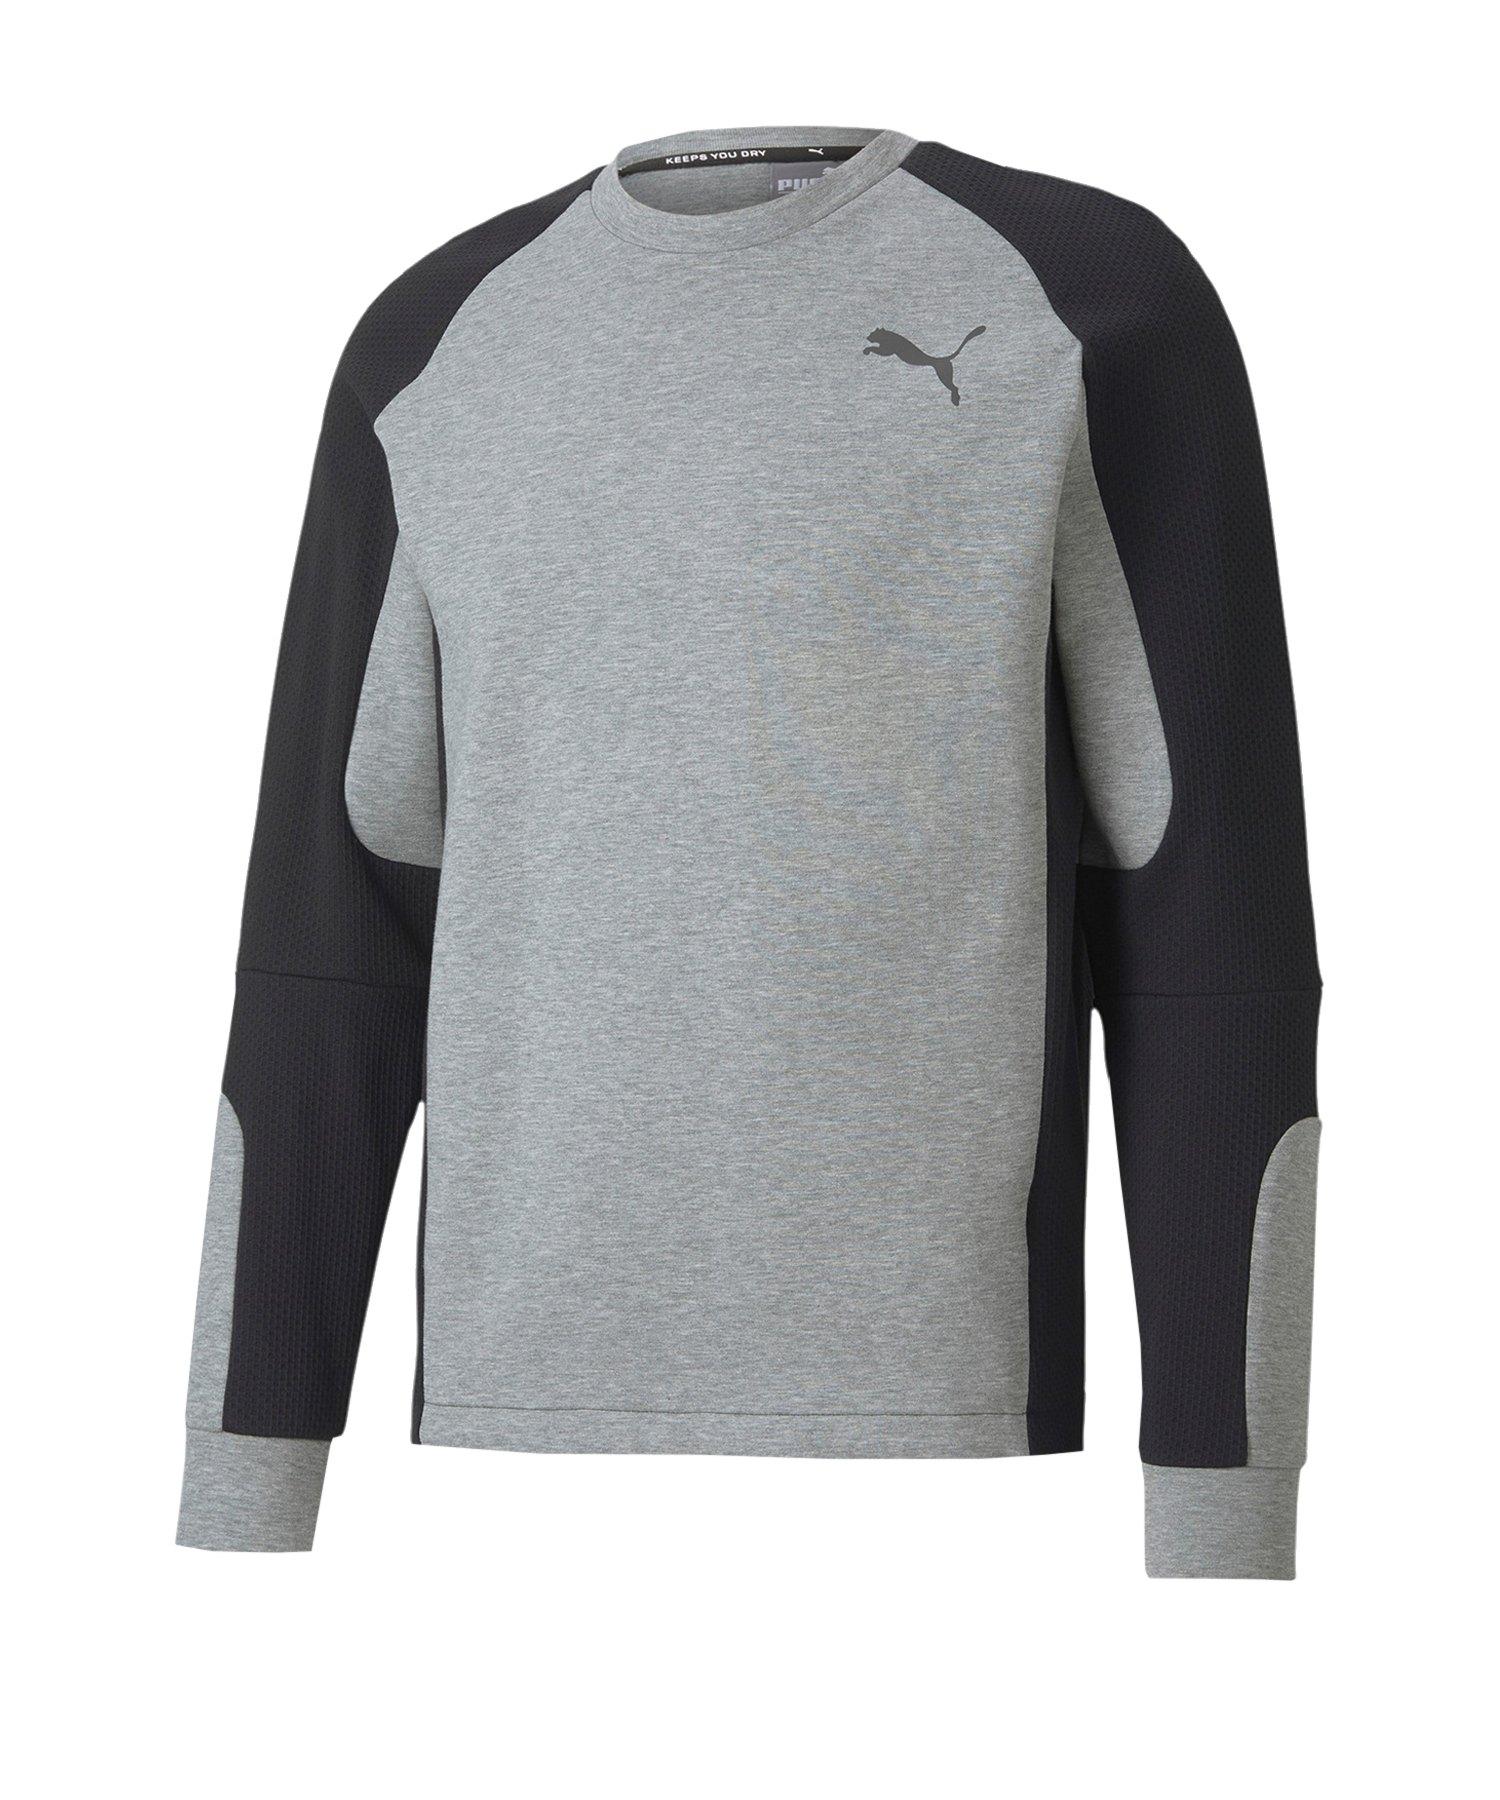 PUMA Evostripe Crew Sweatshirt Grau F03 - grau